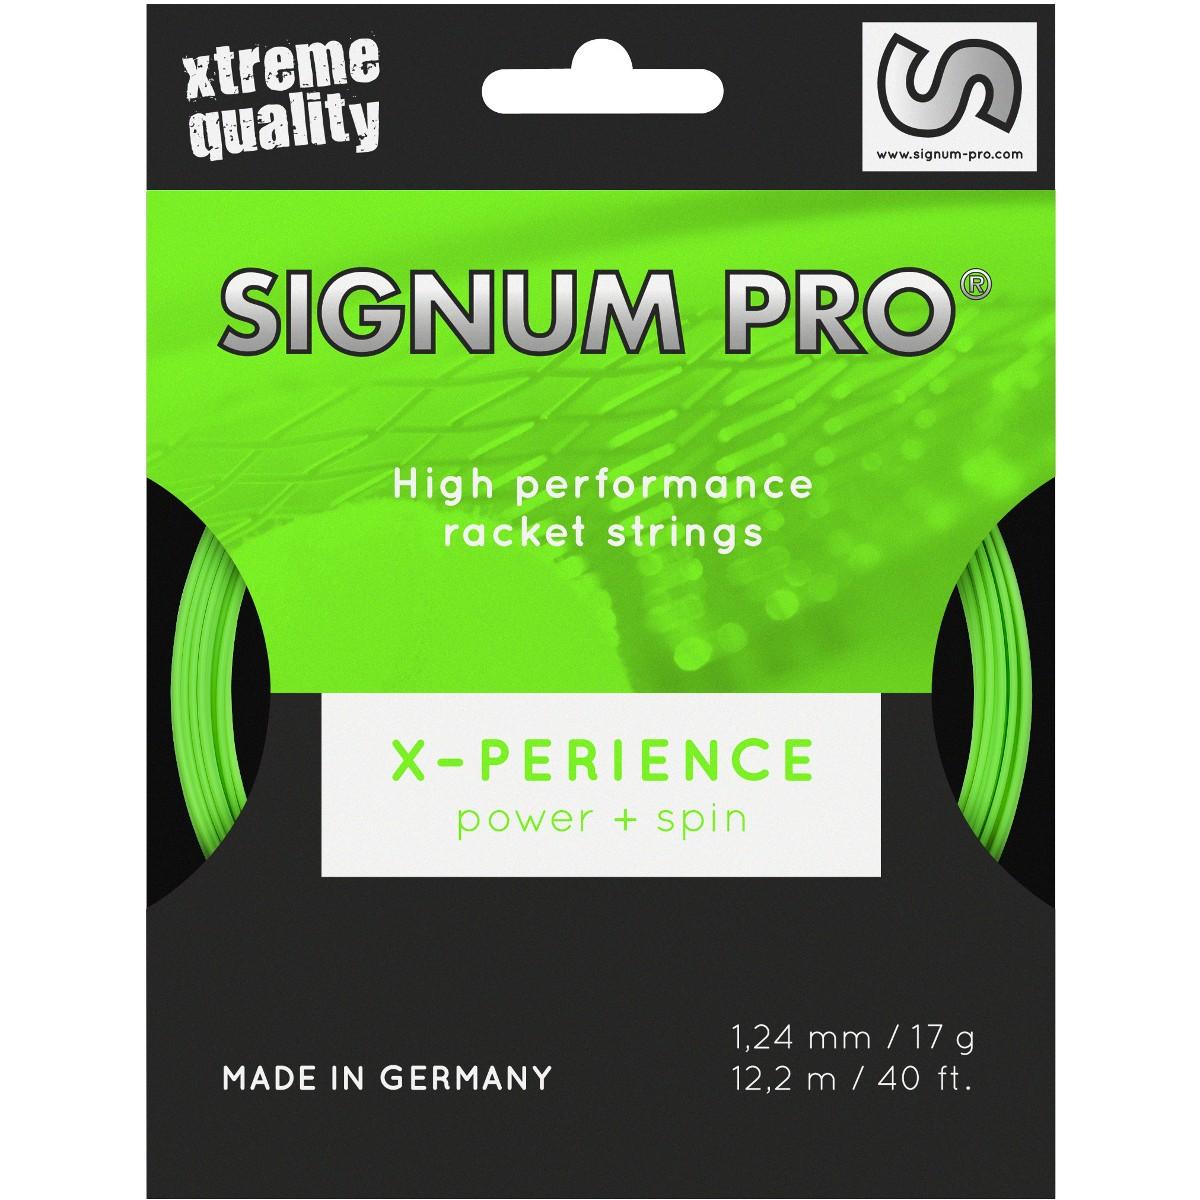 CORDAGE SIGNUM PRO X-PERIENCE (12 METRES)